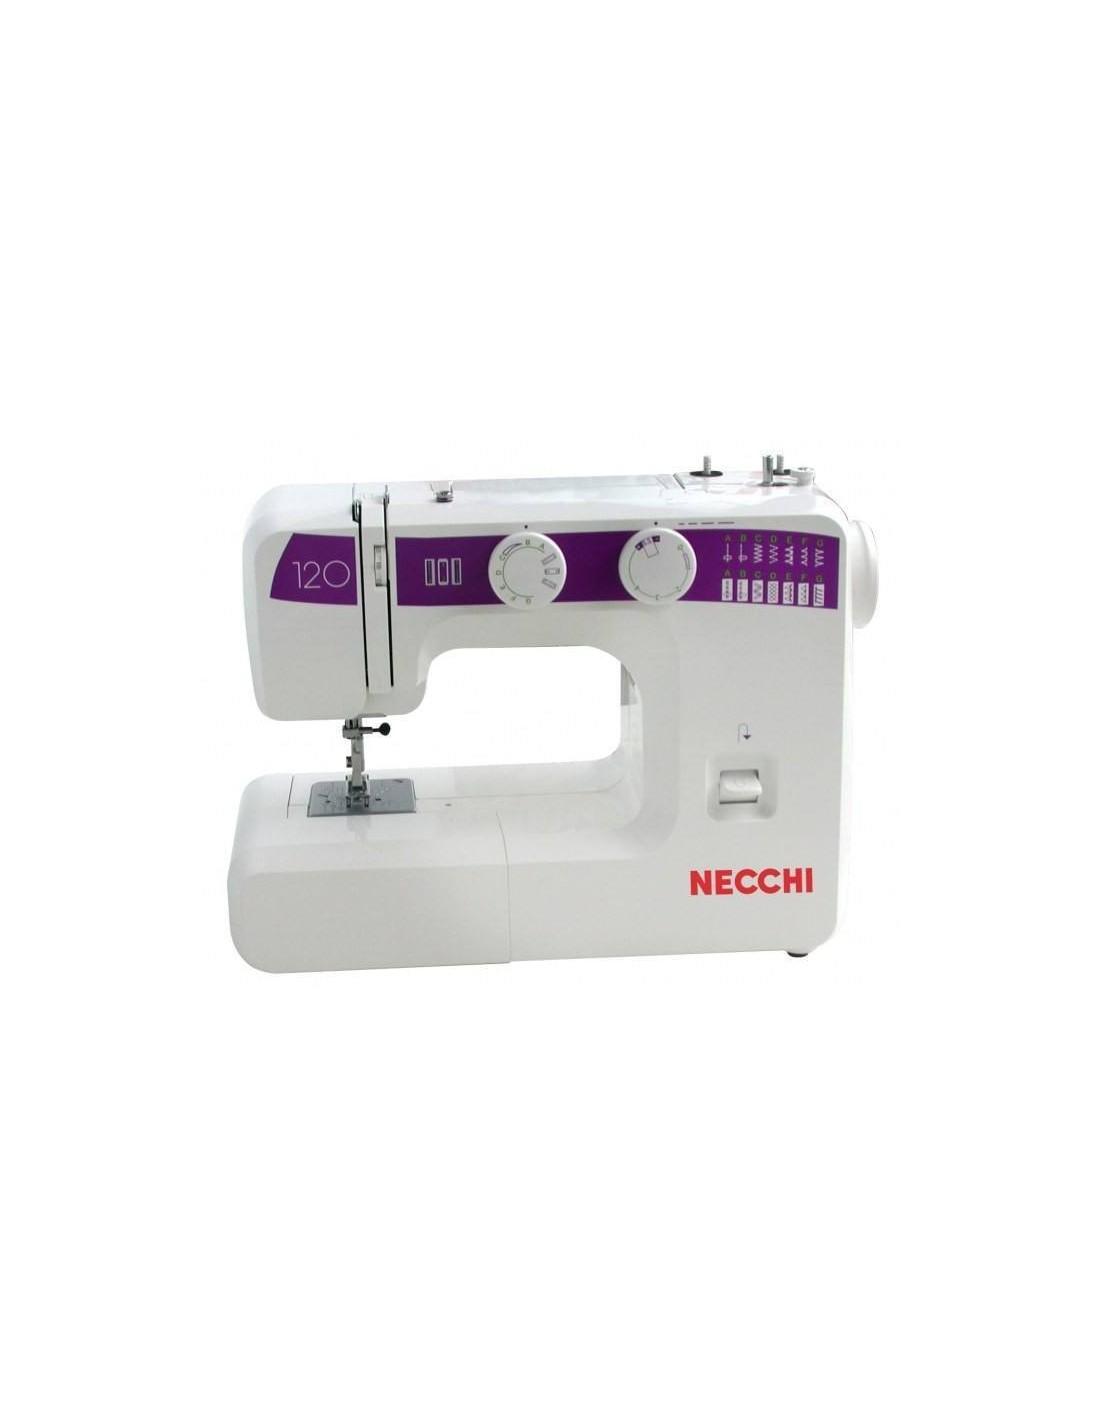 Macchina da cucire necchi n120 macchine per cucire for Pedale per macchina da cucire necchi